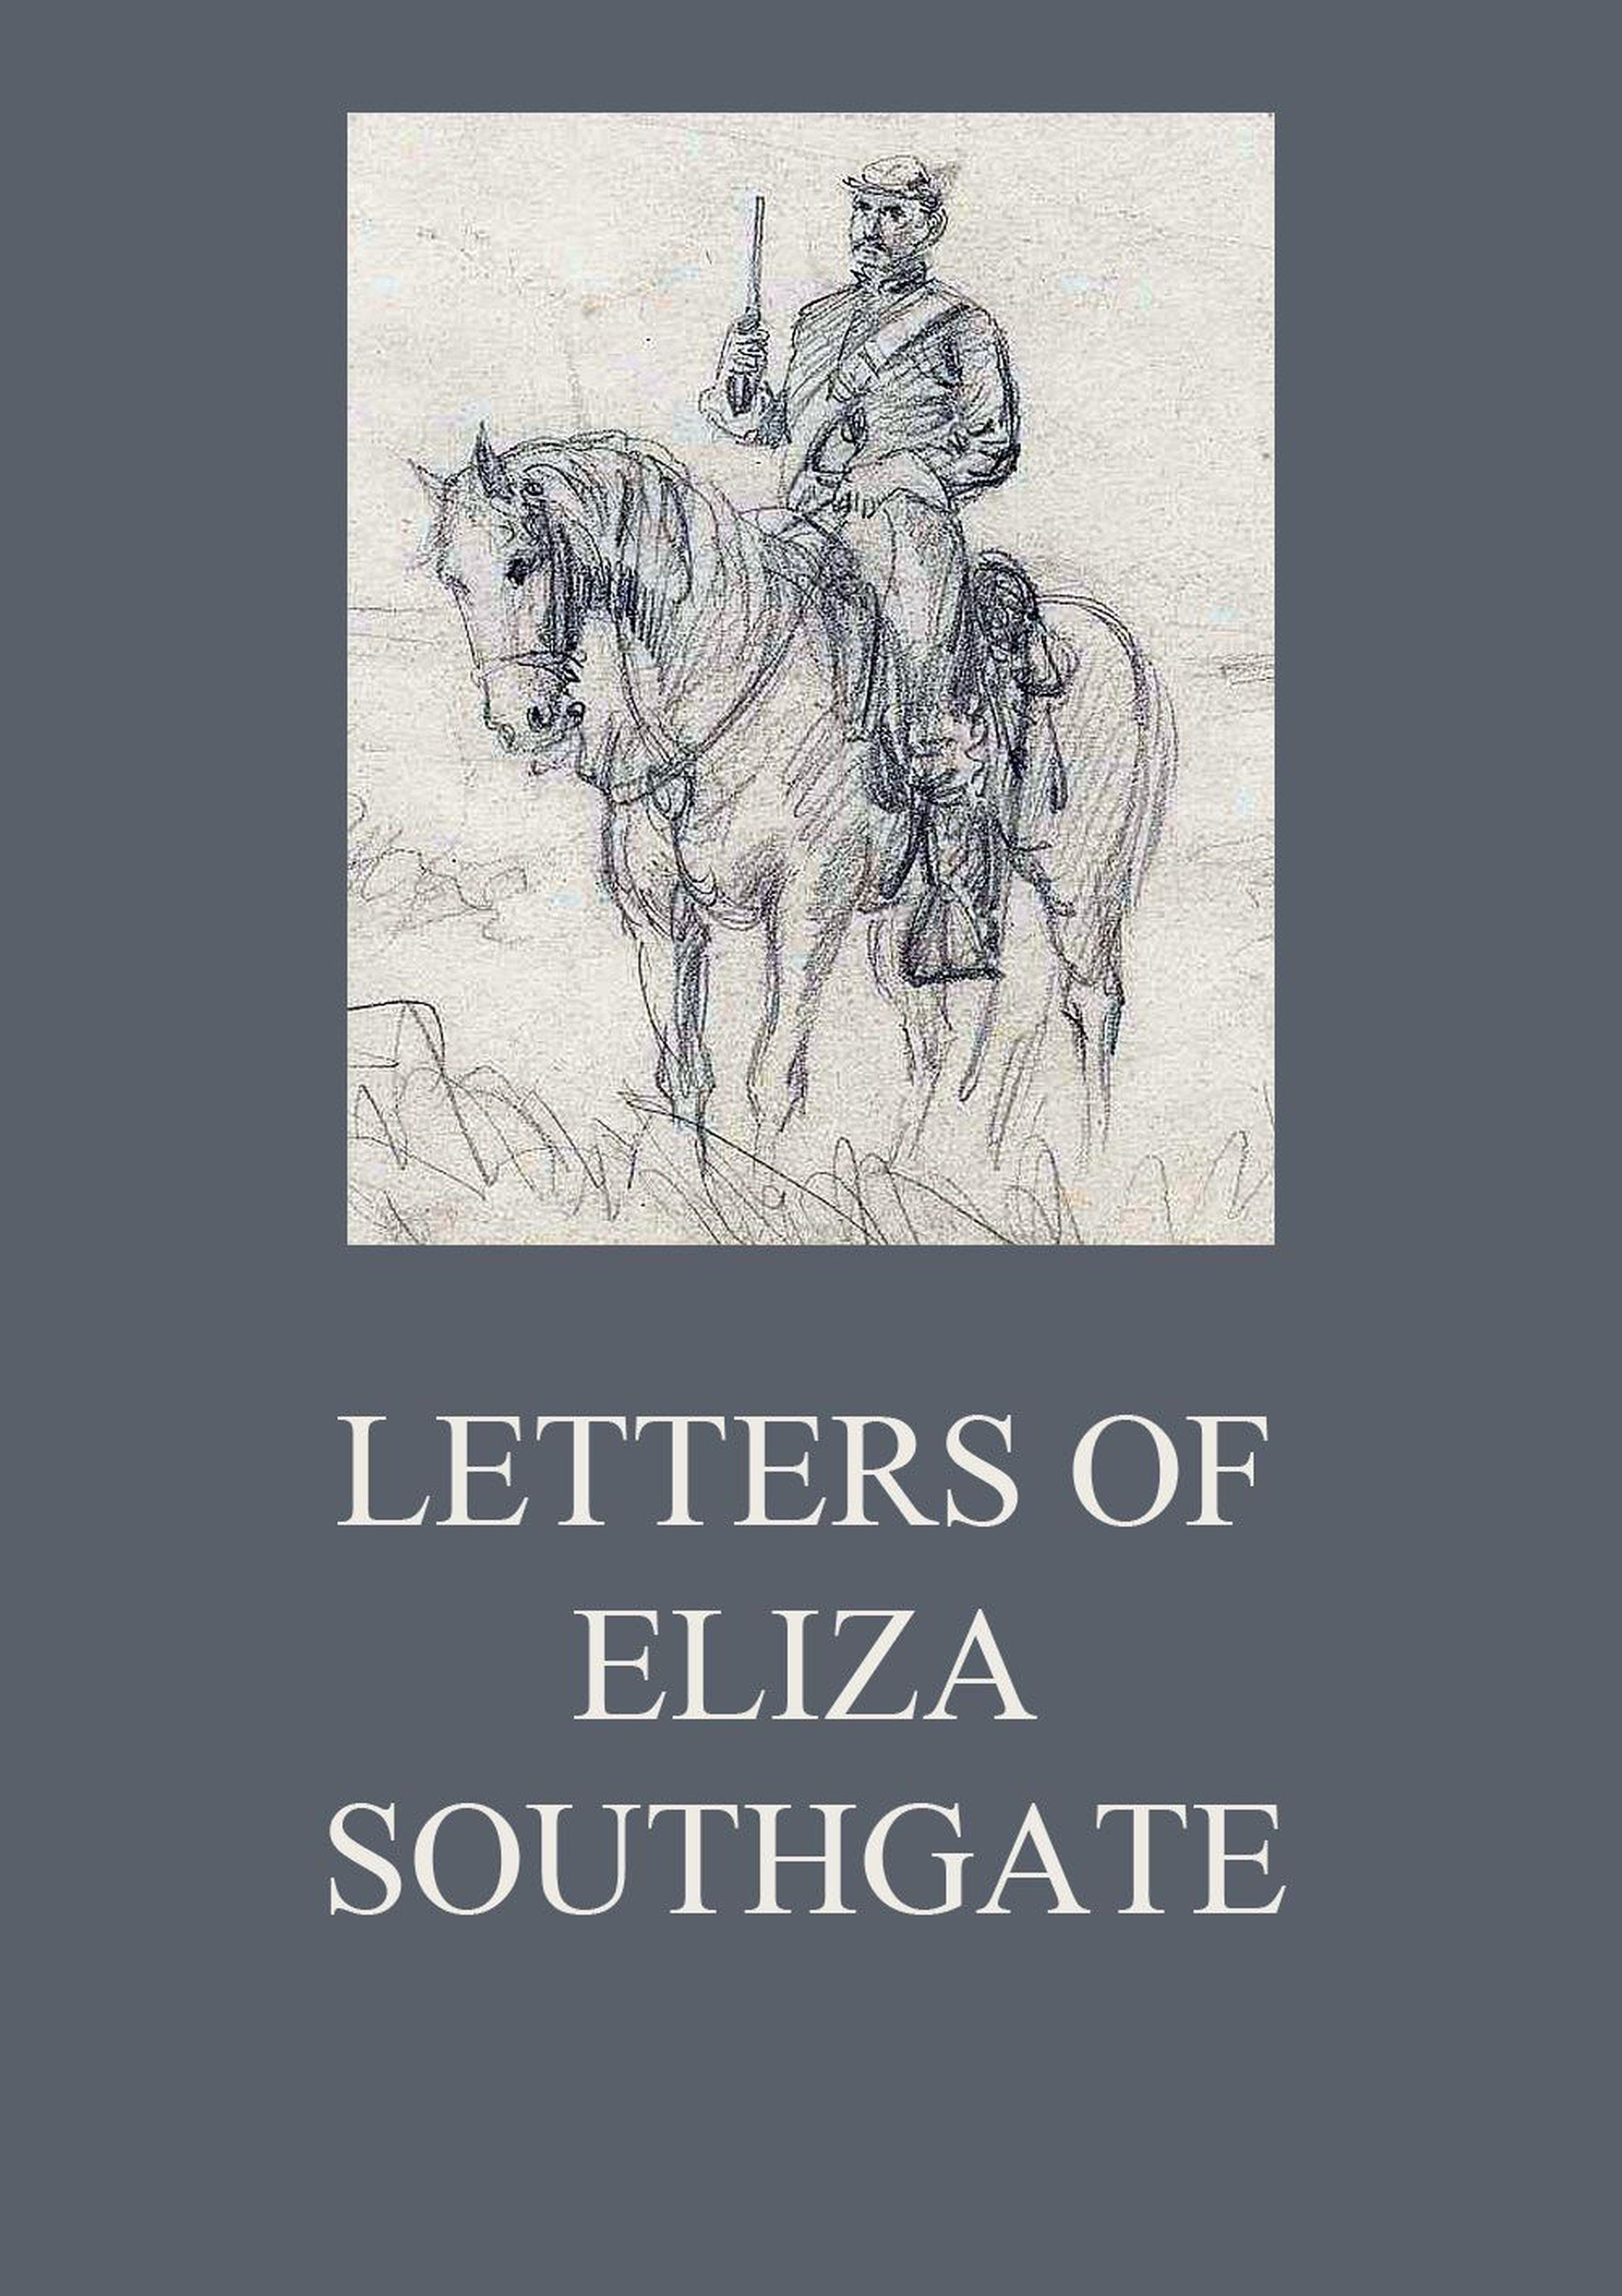 Eliza Southgate Letters of Eliza Southgate barbara monajem notorious eliza